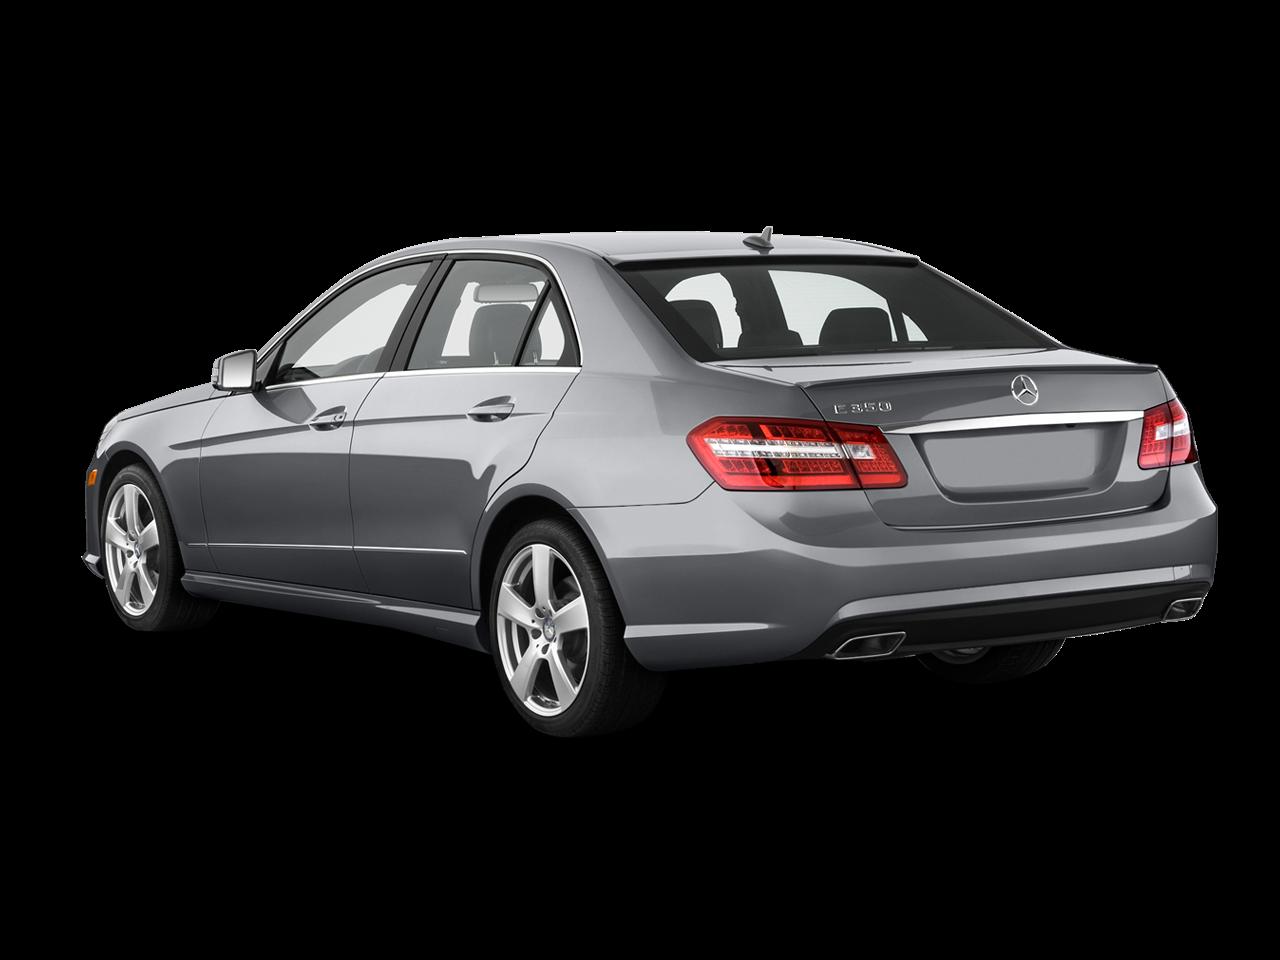 2010 Mercedes-Benz E-class Coupe - Mercedes Benz Luxury ...